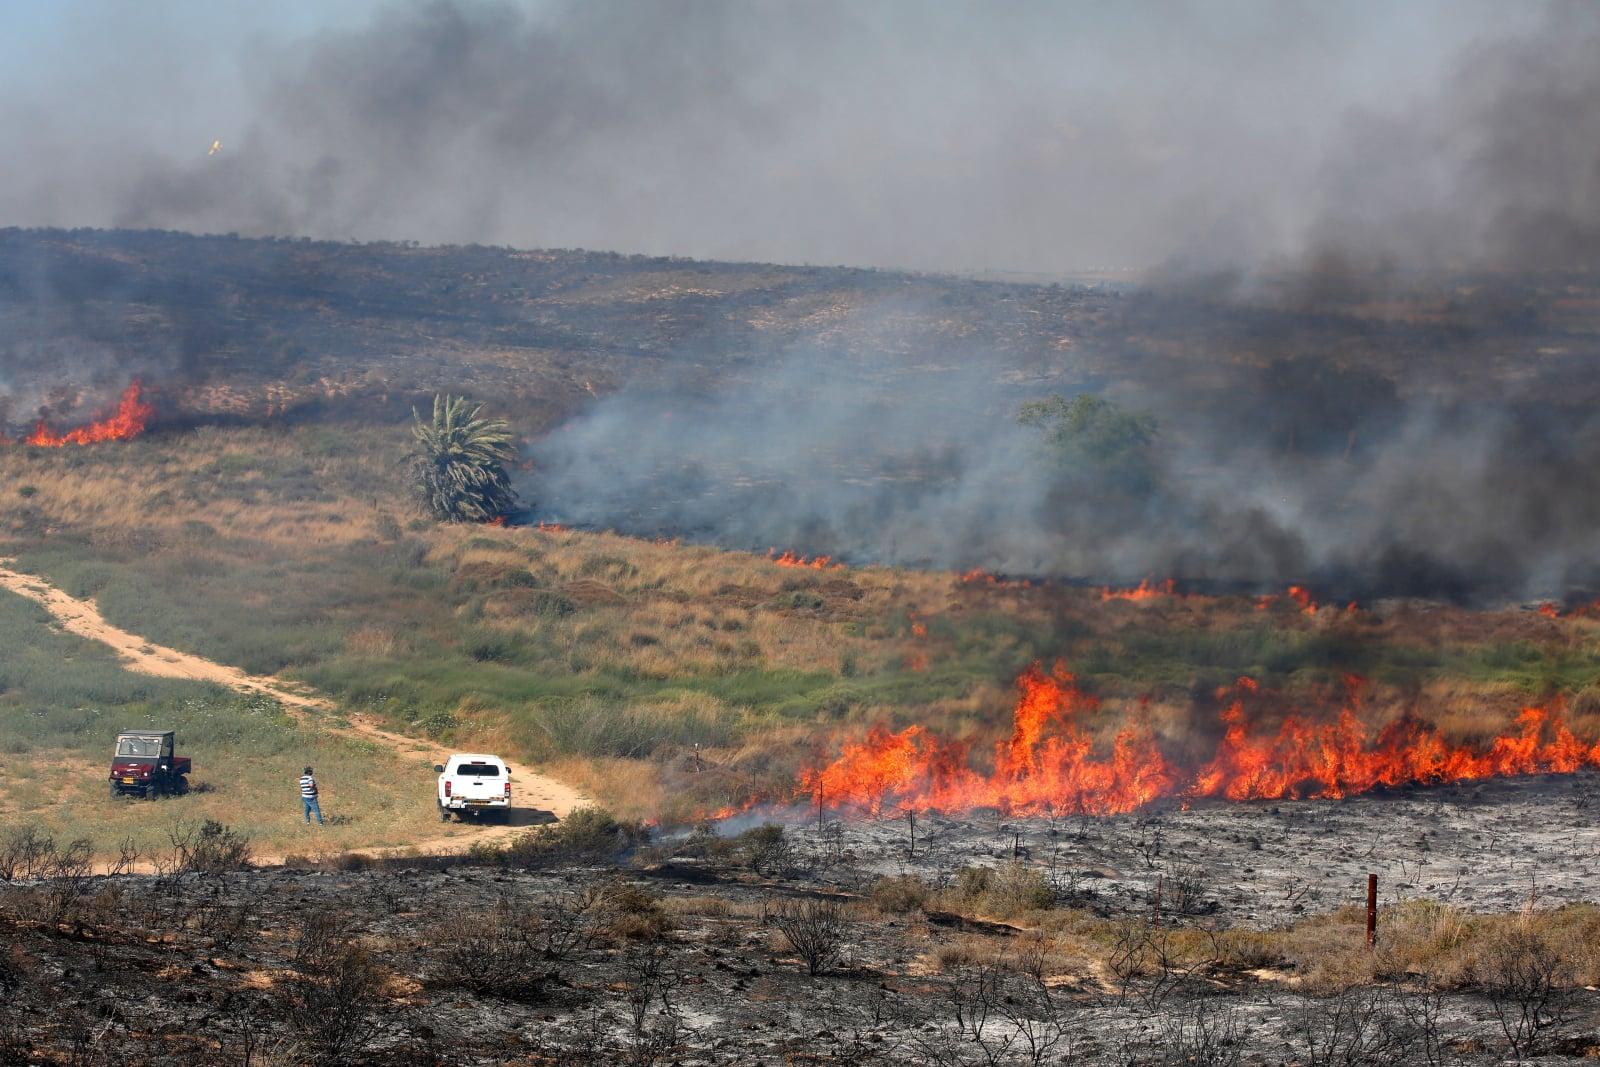 Konflikt izraelsko-palestyński fot. EPA/ABIR SULTAN